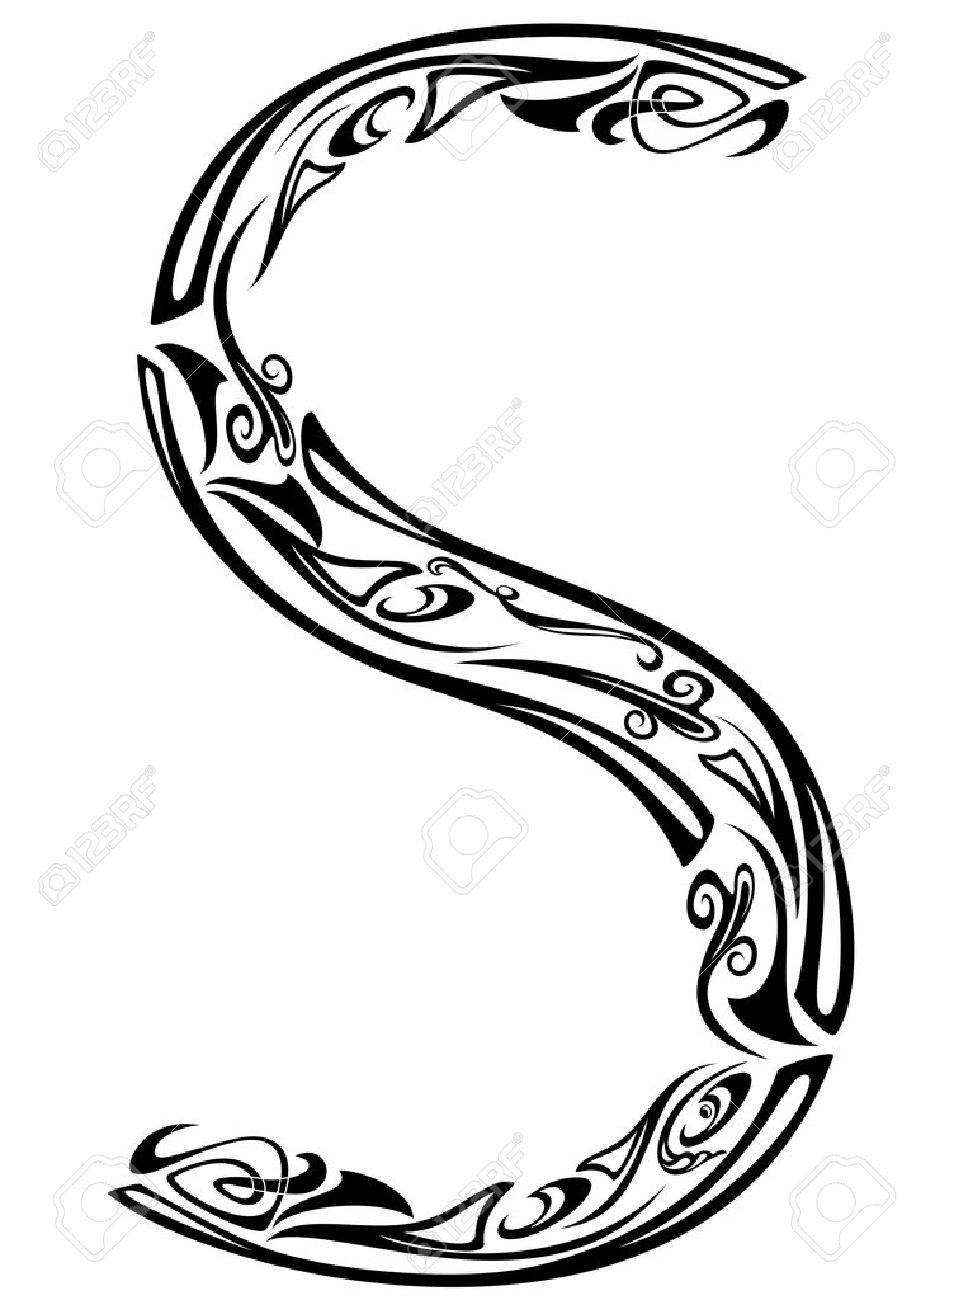 Art Nouveau floral style font - letter S - black and white fine vector outline Stock Vector - 11985016